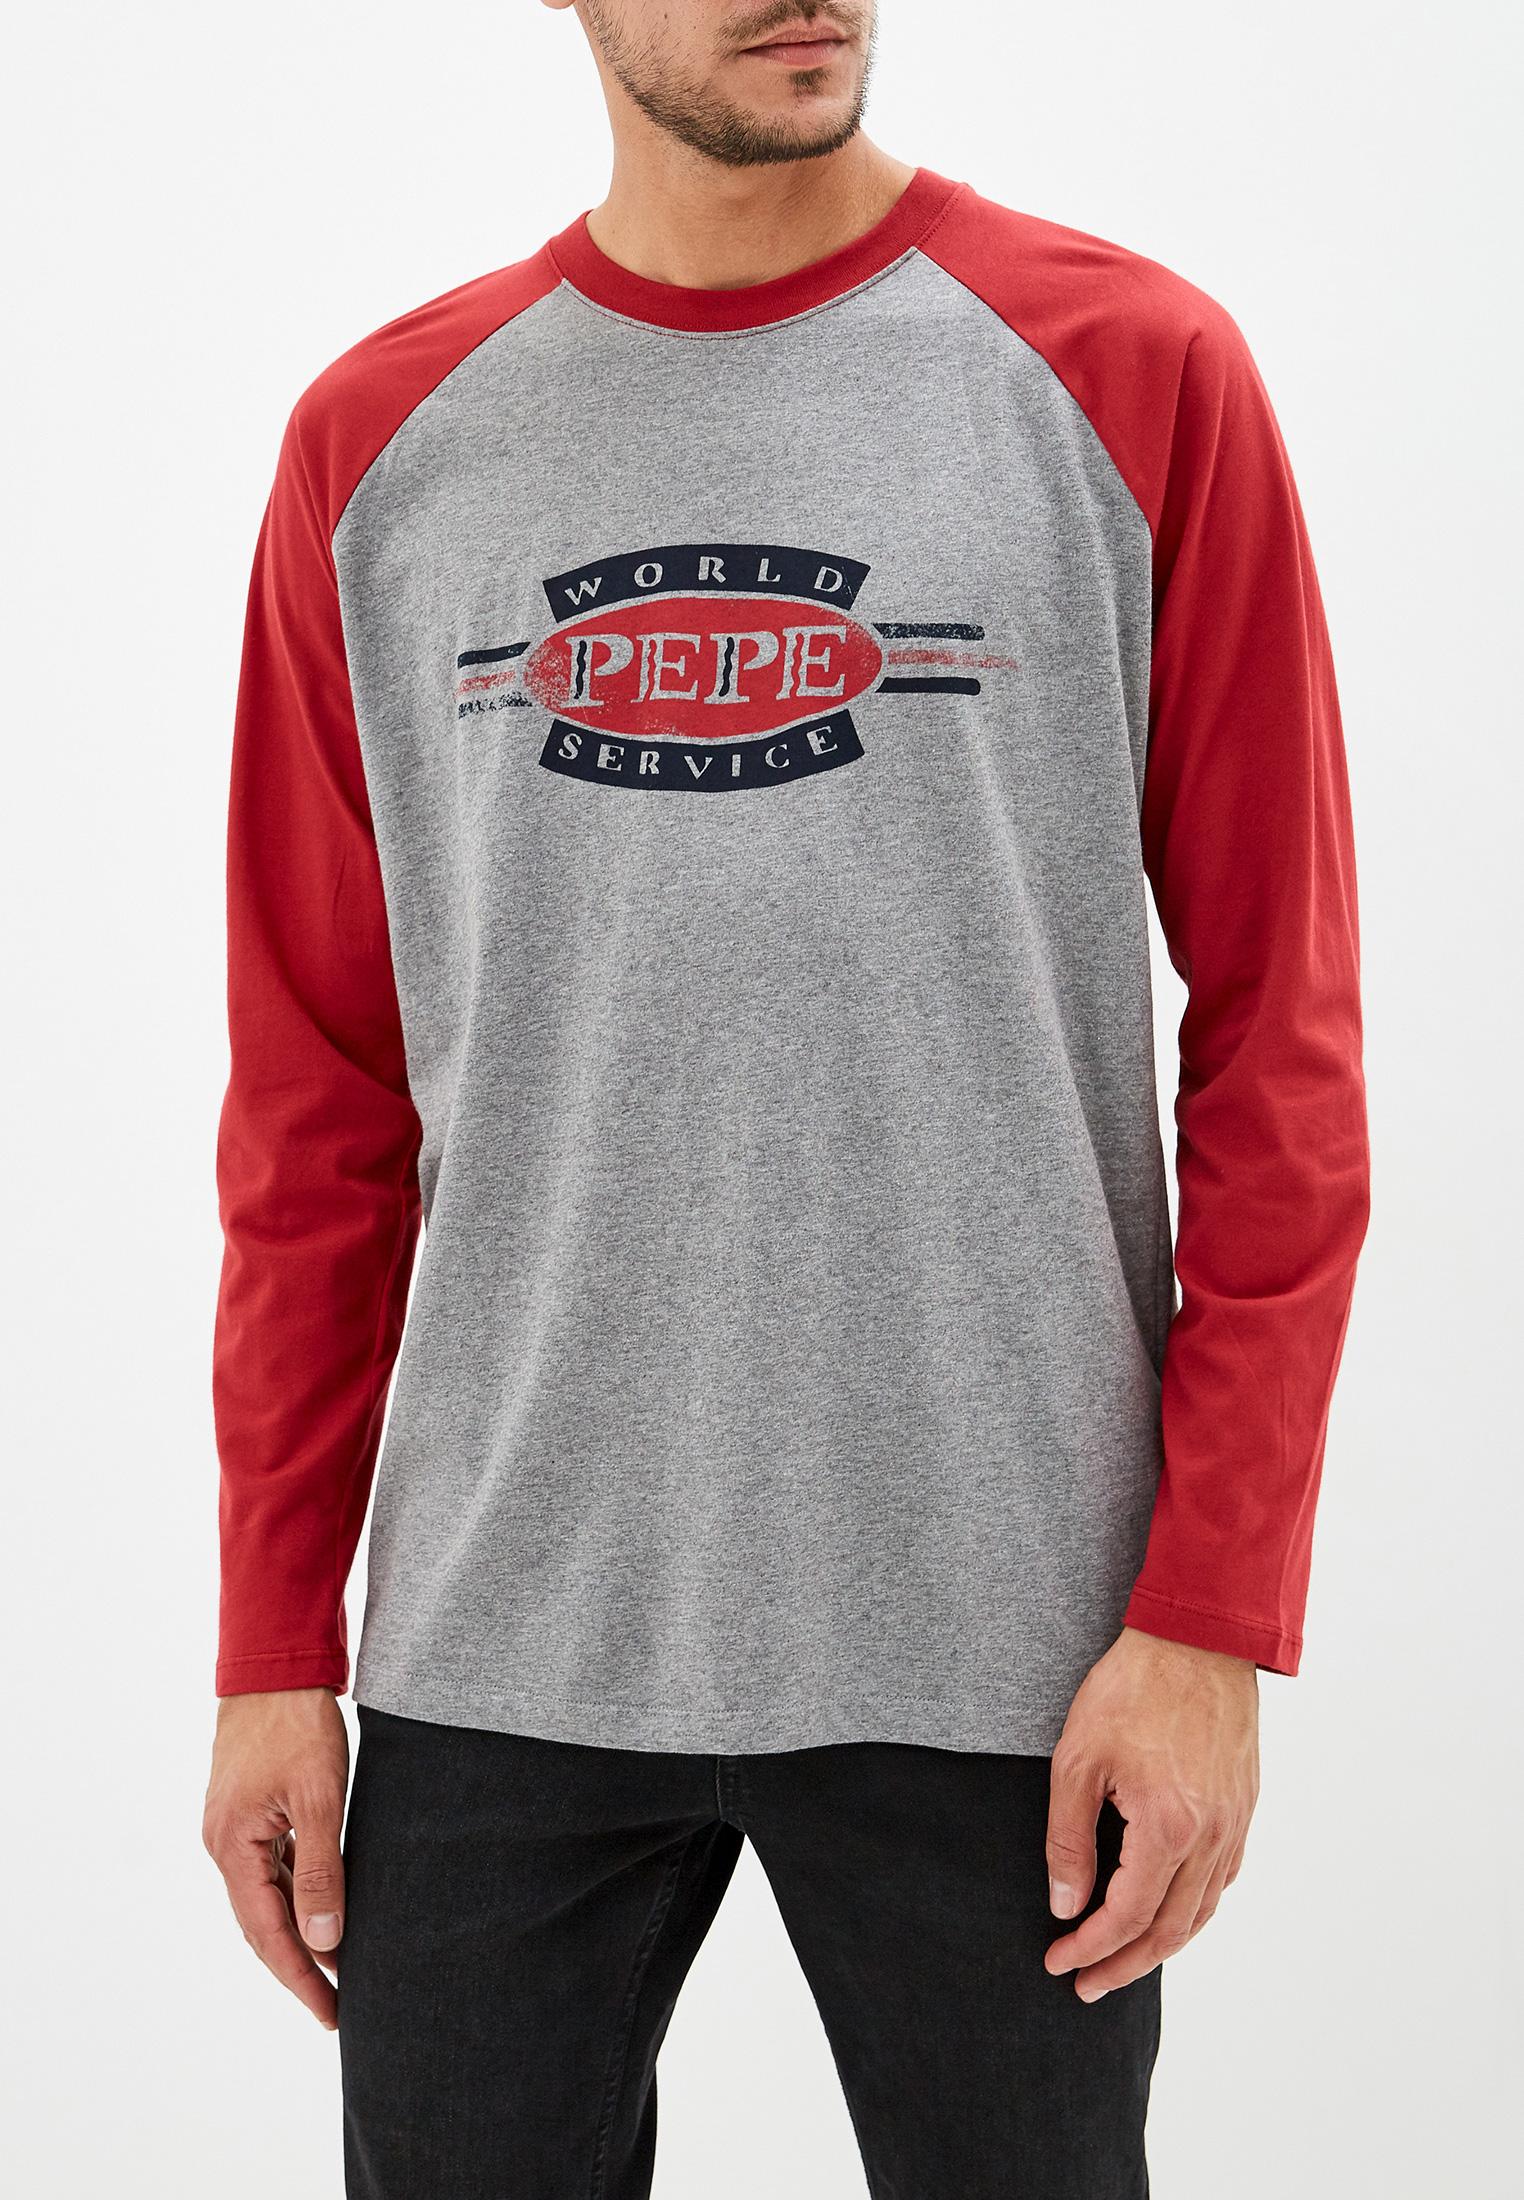 Футболка с длинным рукавом Pepe Jeans (Пепе Джинс) PM506748